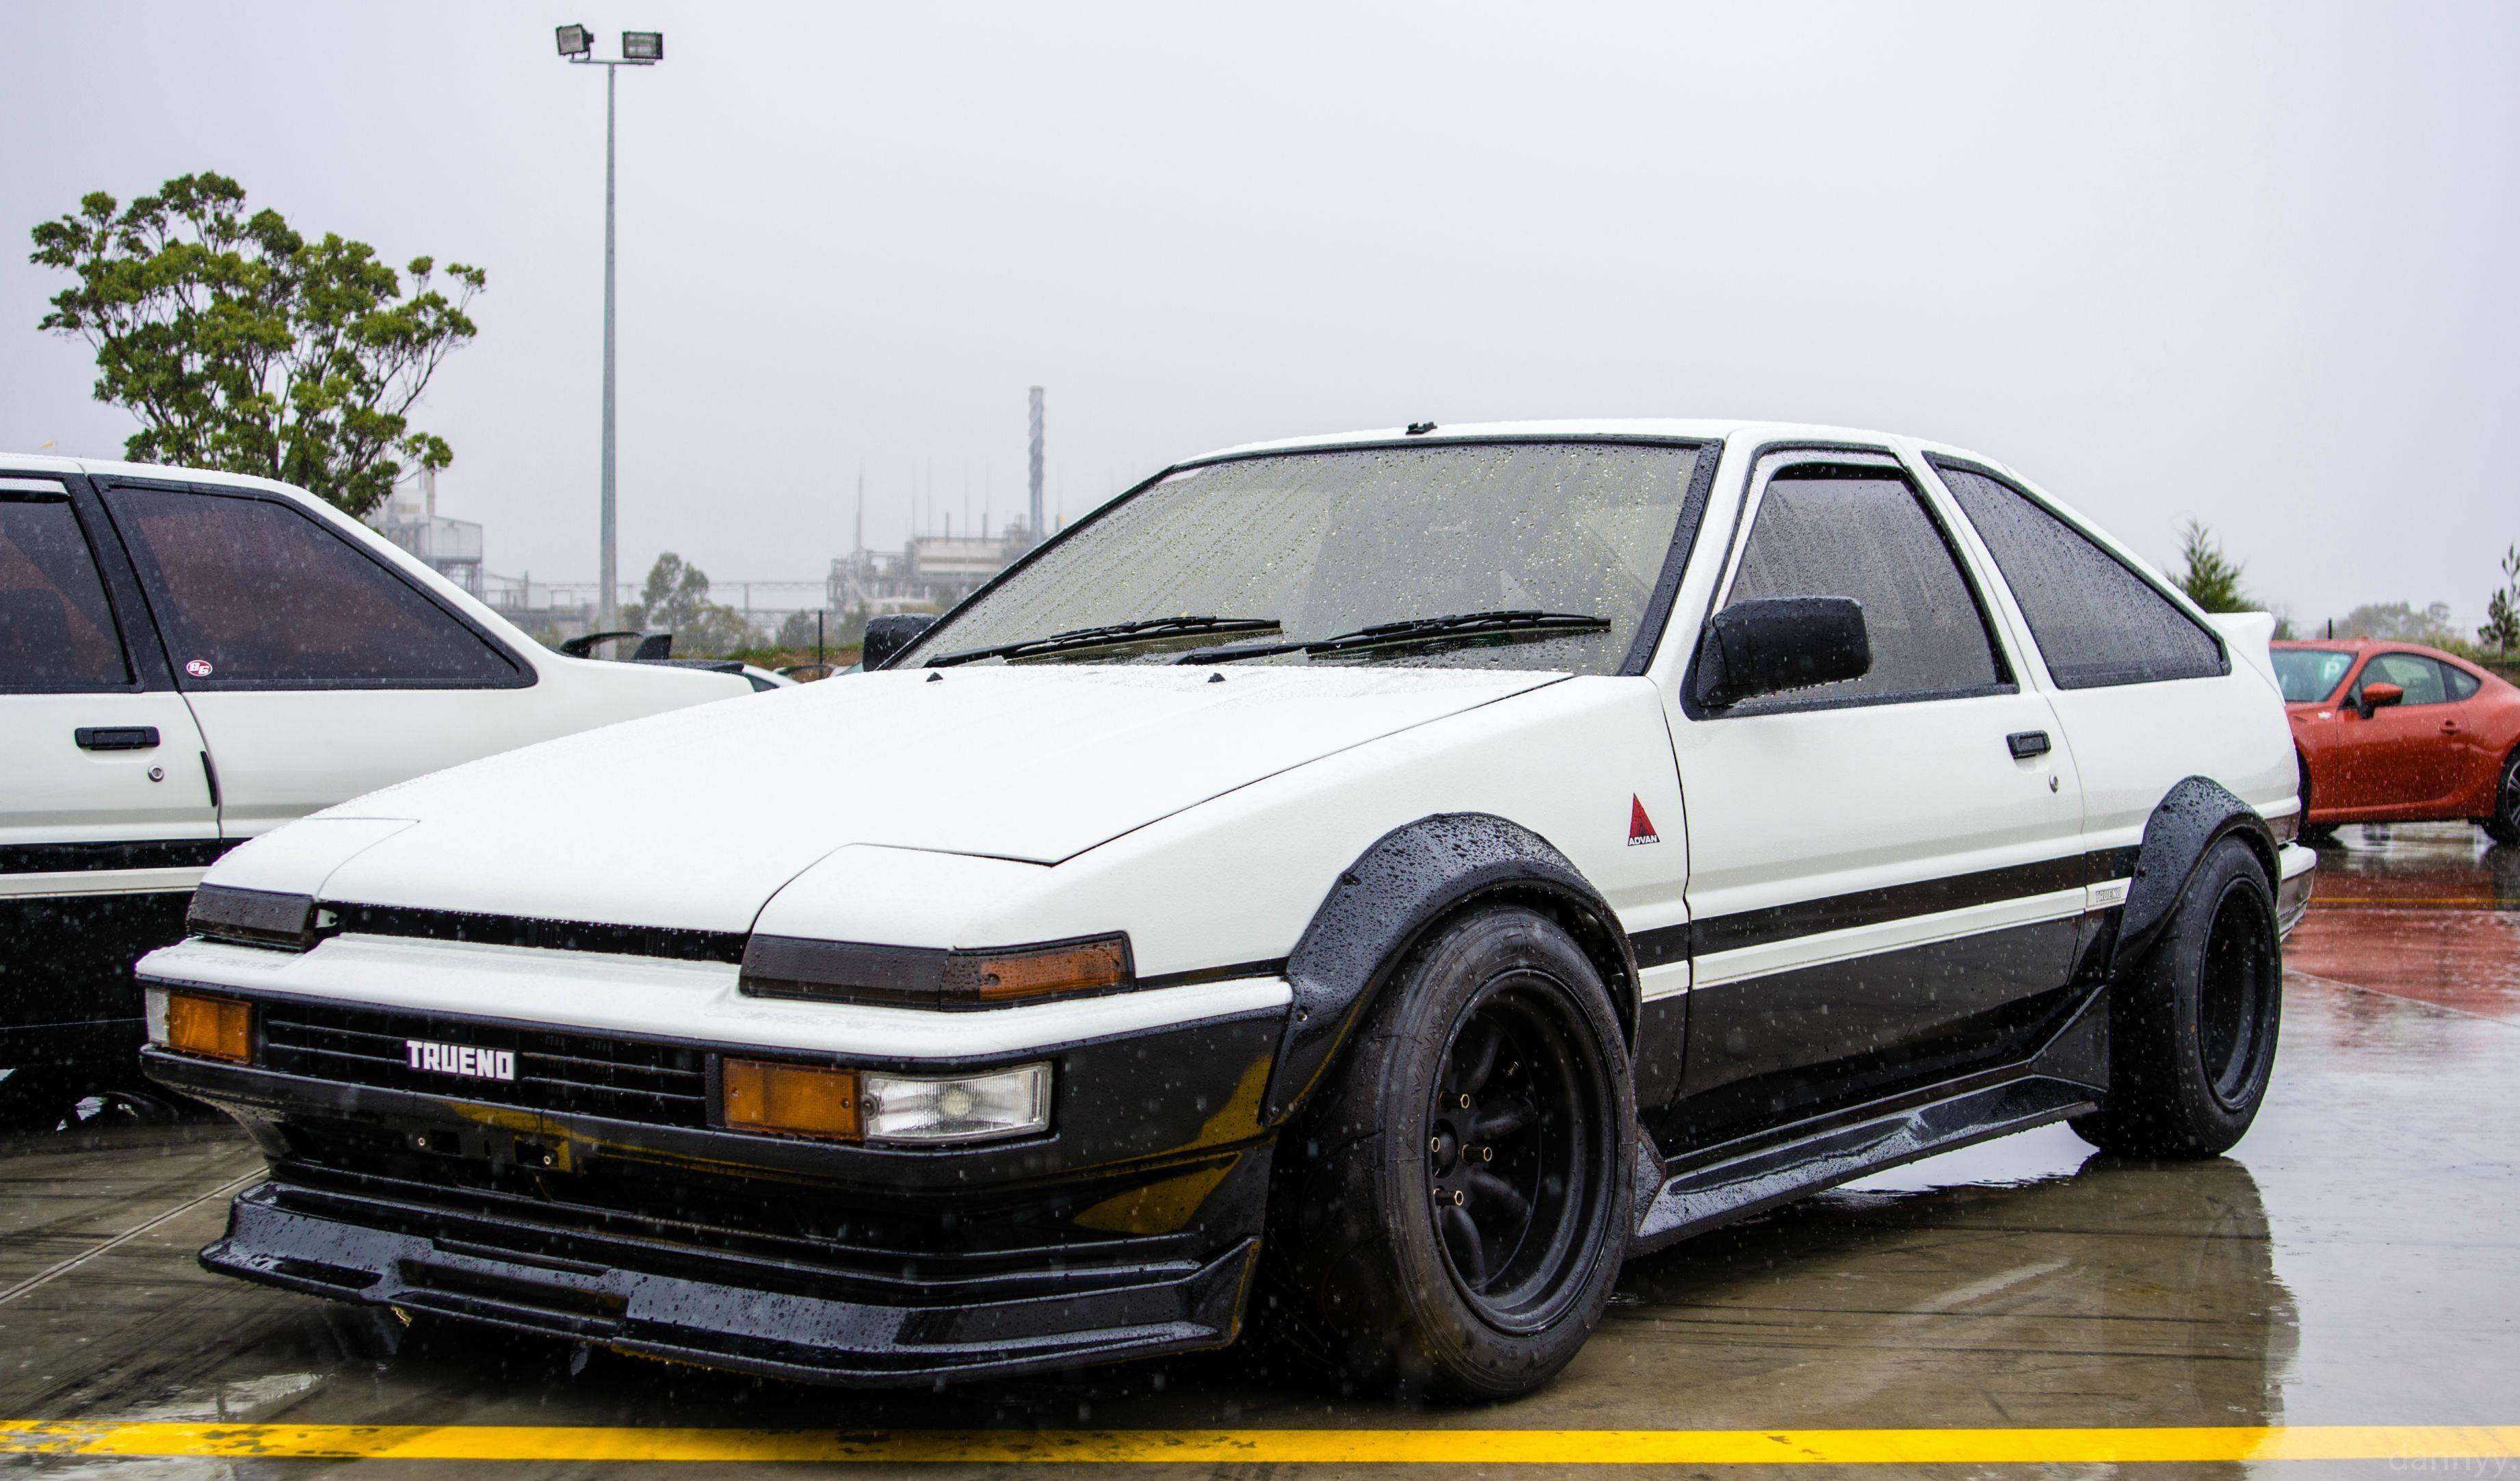 Honda Cr X >> Wallpaper : Japanese cars, sports car, Toyota AE86, coupe, Sedan, land vehicle, automotive ...